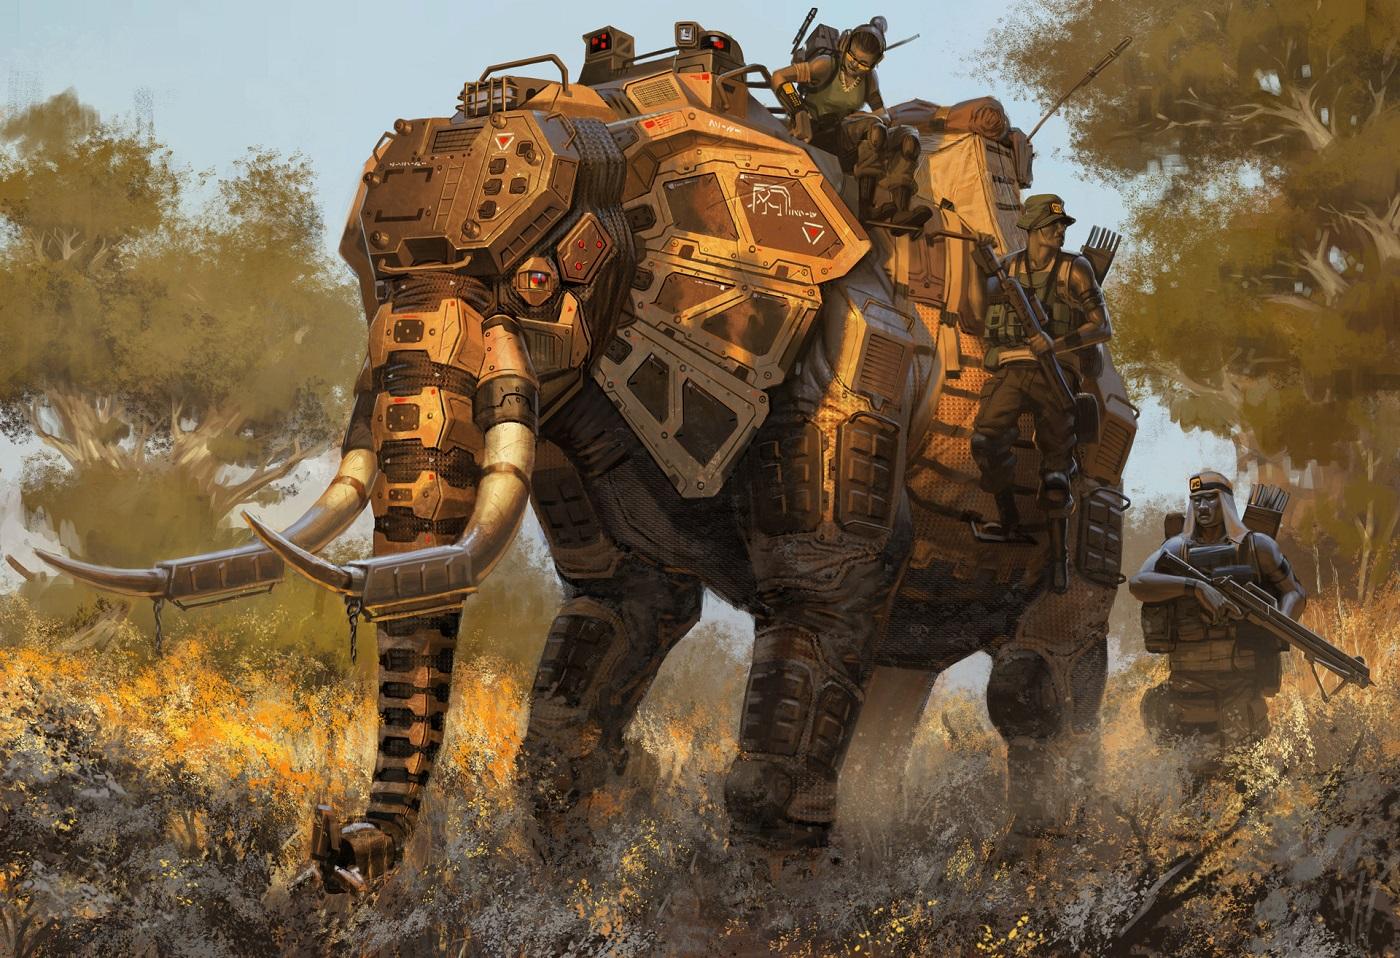 robert-chew-mecha-elephant-painting-medium.jpg